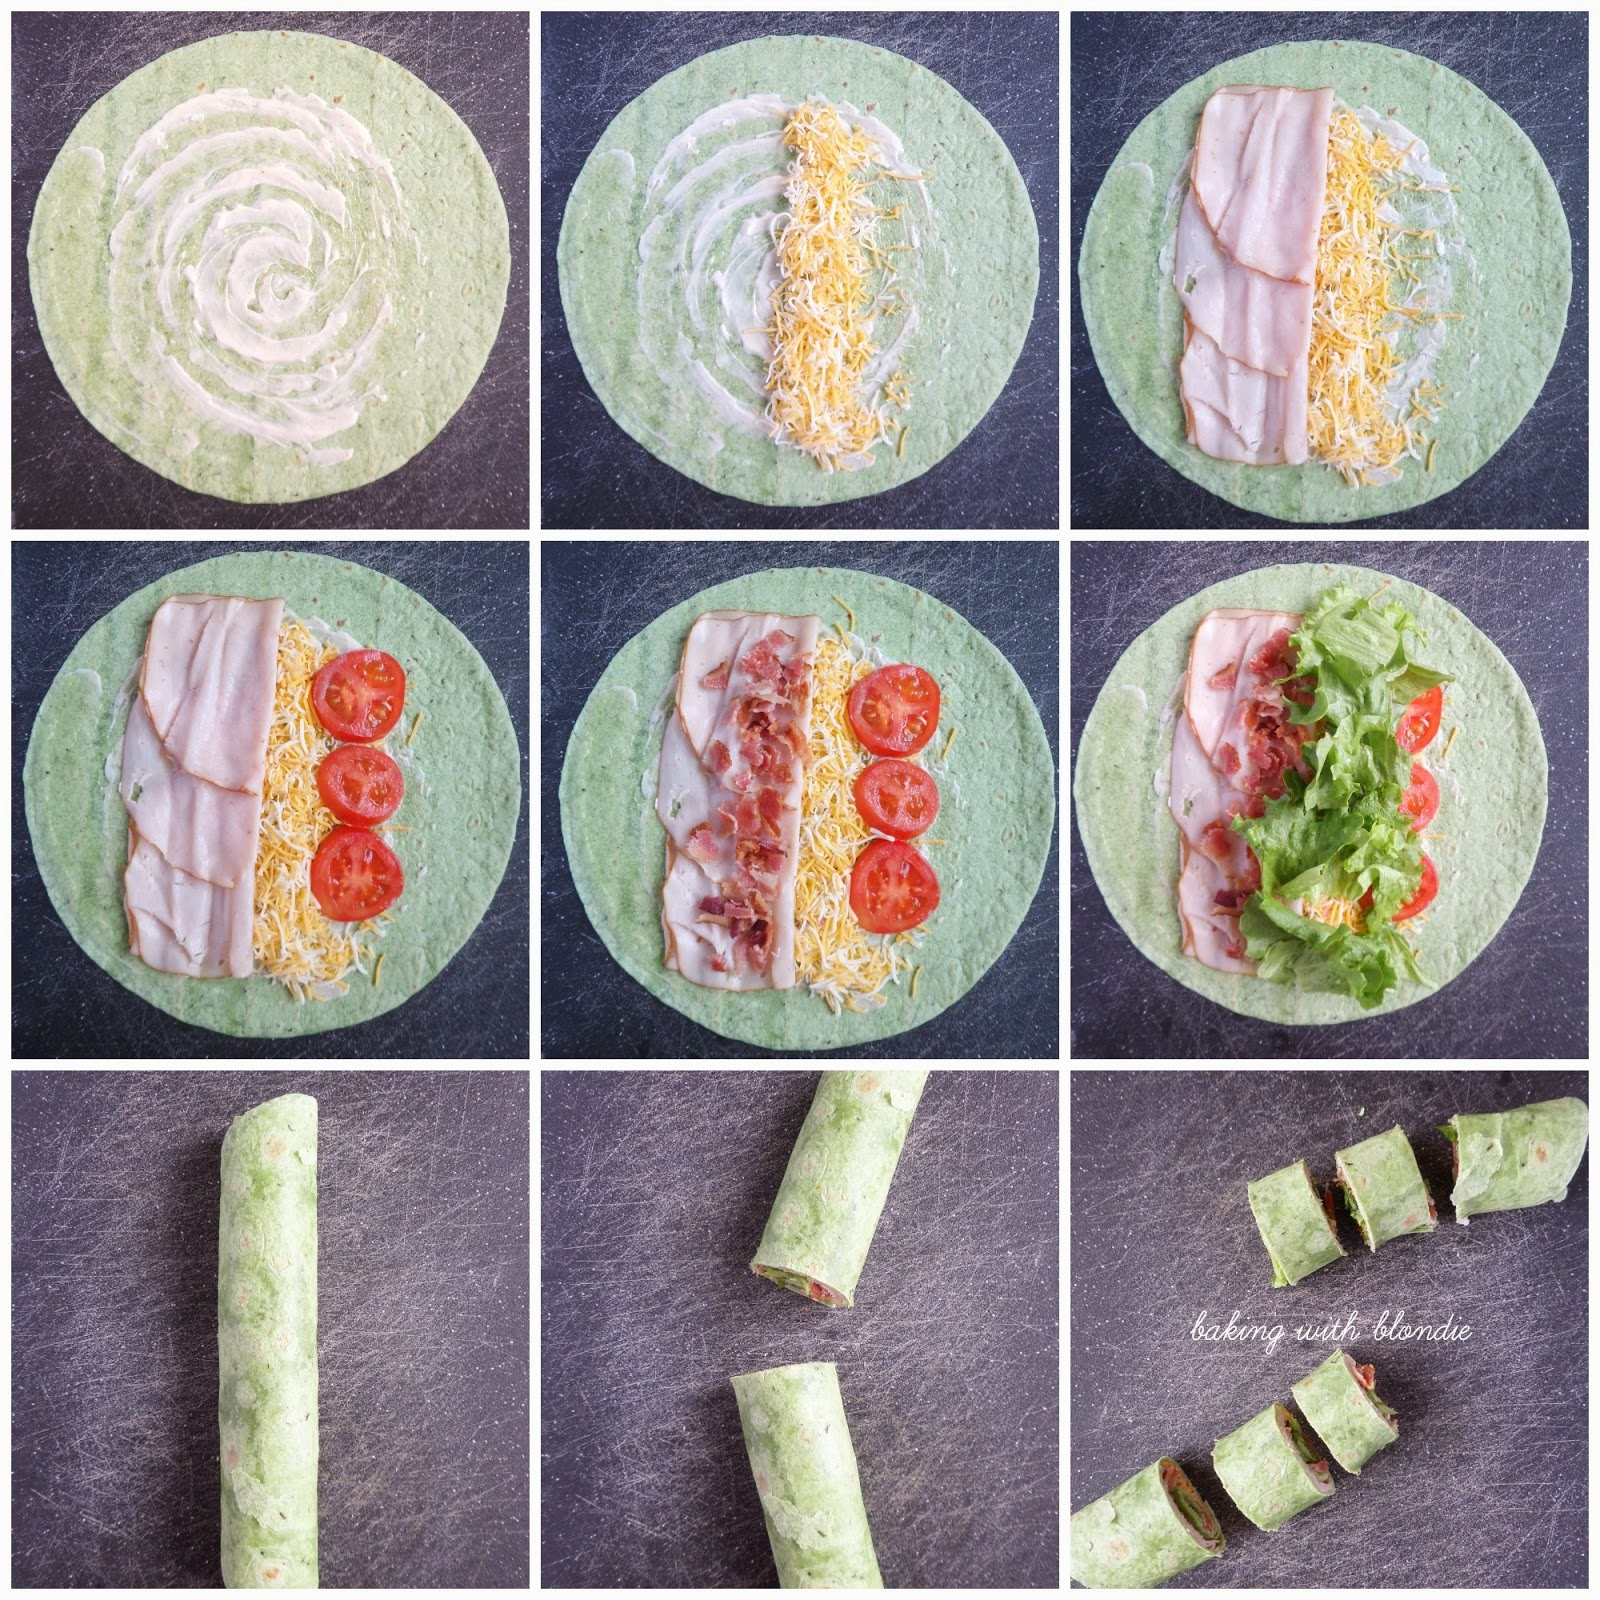 how to make plato wraps